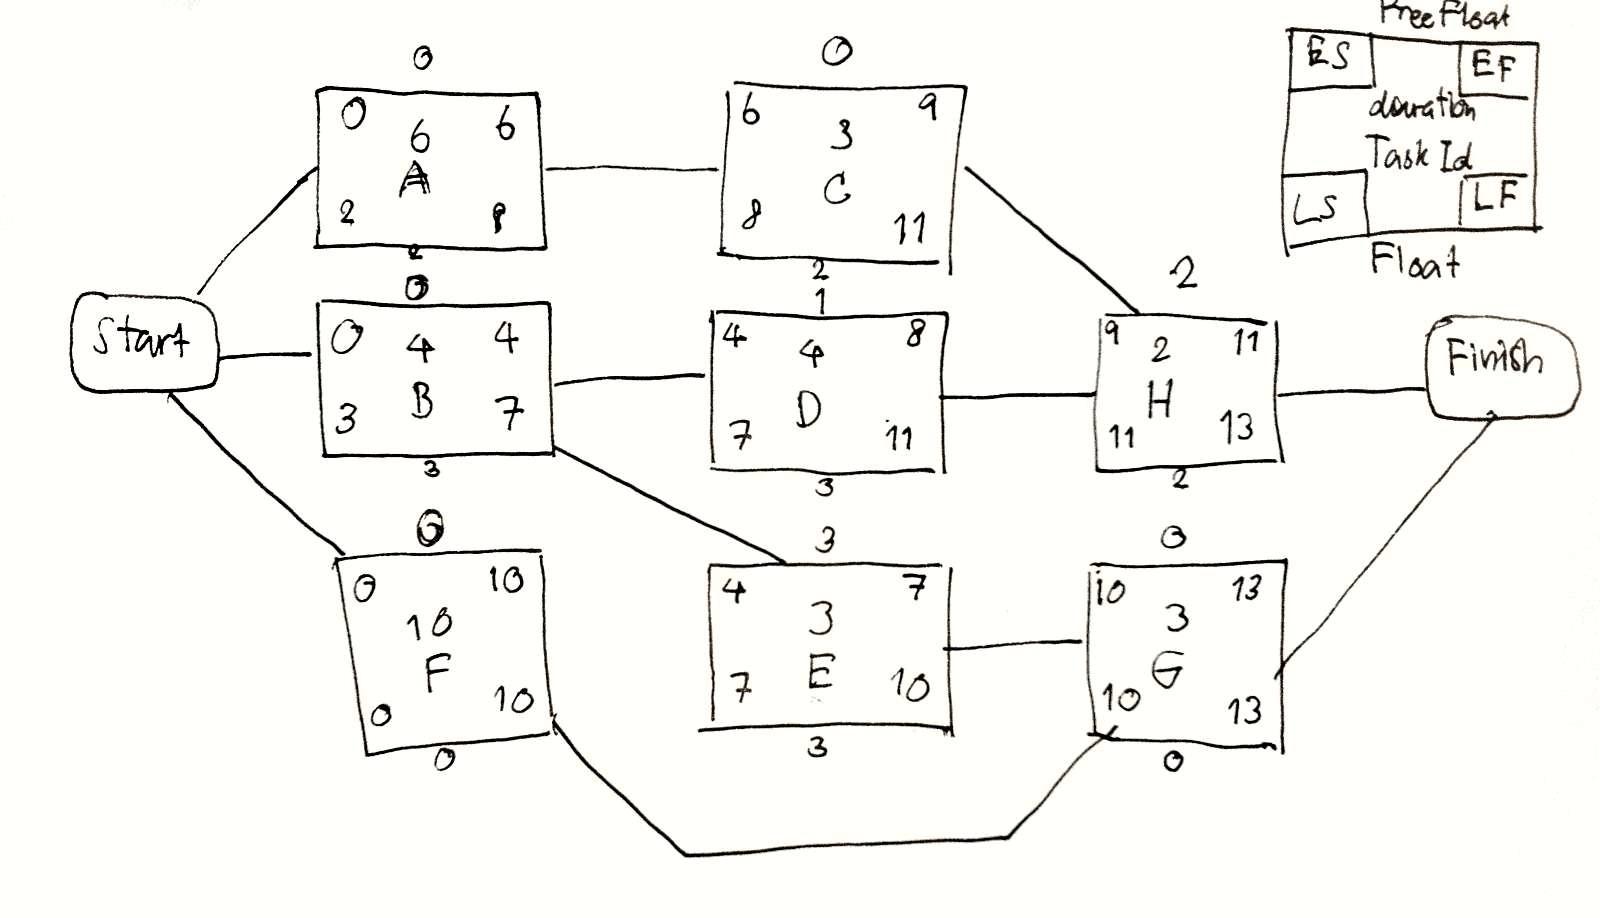 How To Do A Precedence Network Diagram Activity On Node